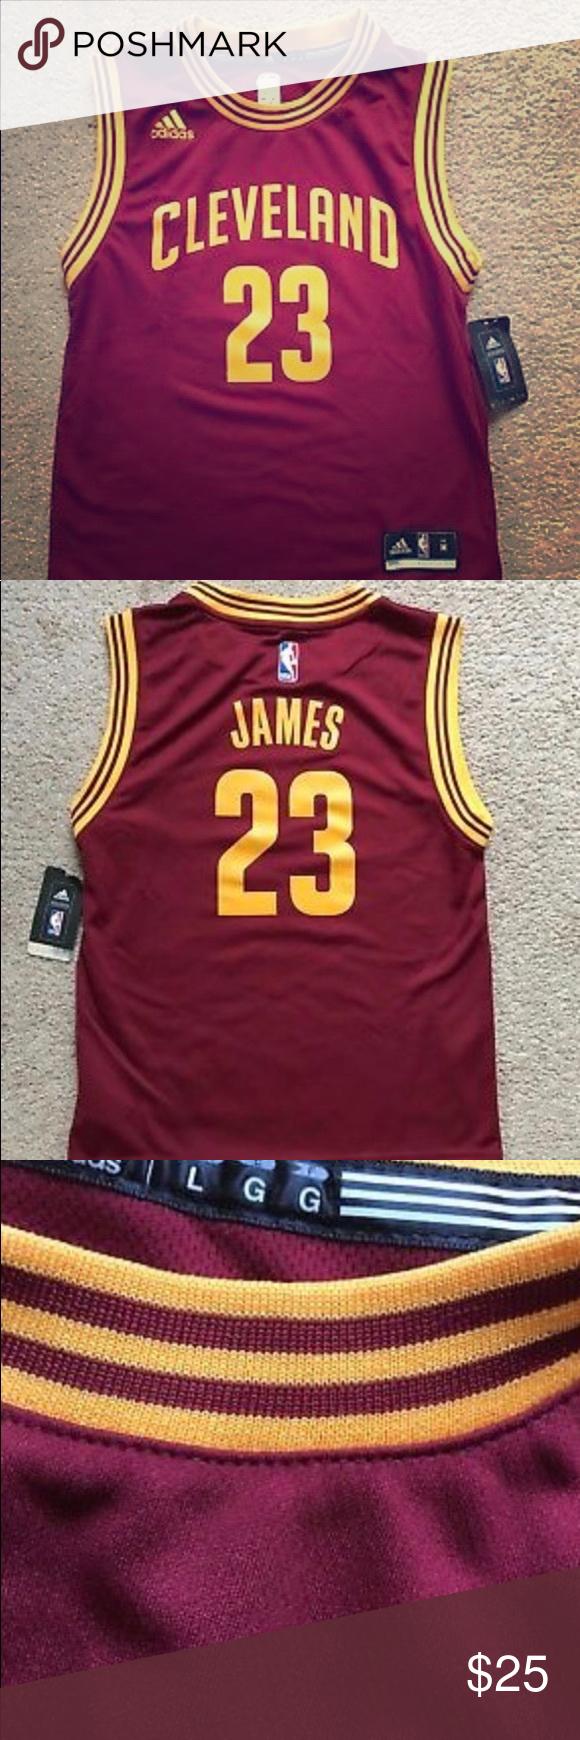 Novedades con etiquetas adidas etiquetas Camiseta NWT Cleveland adidas Cavaliers NWT 9fab998 - sulfasalazisalaz.website